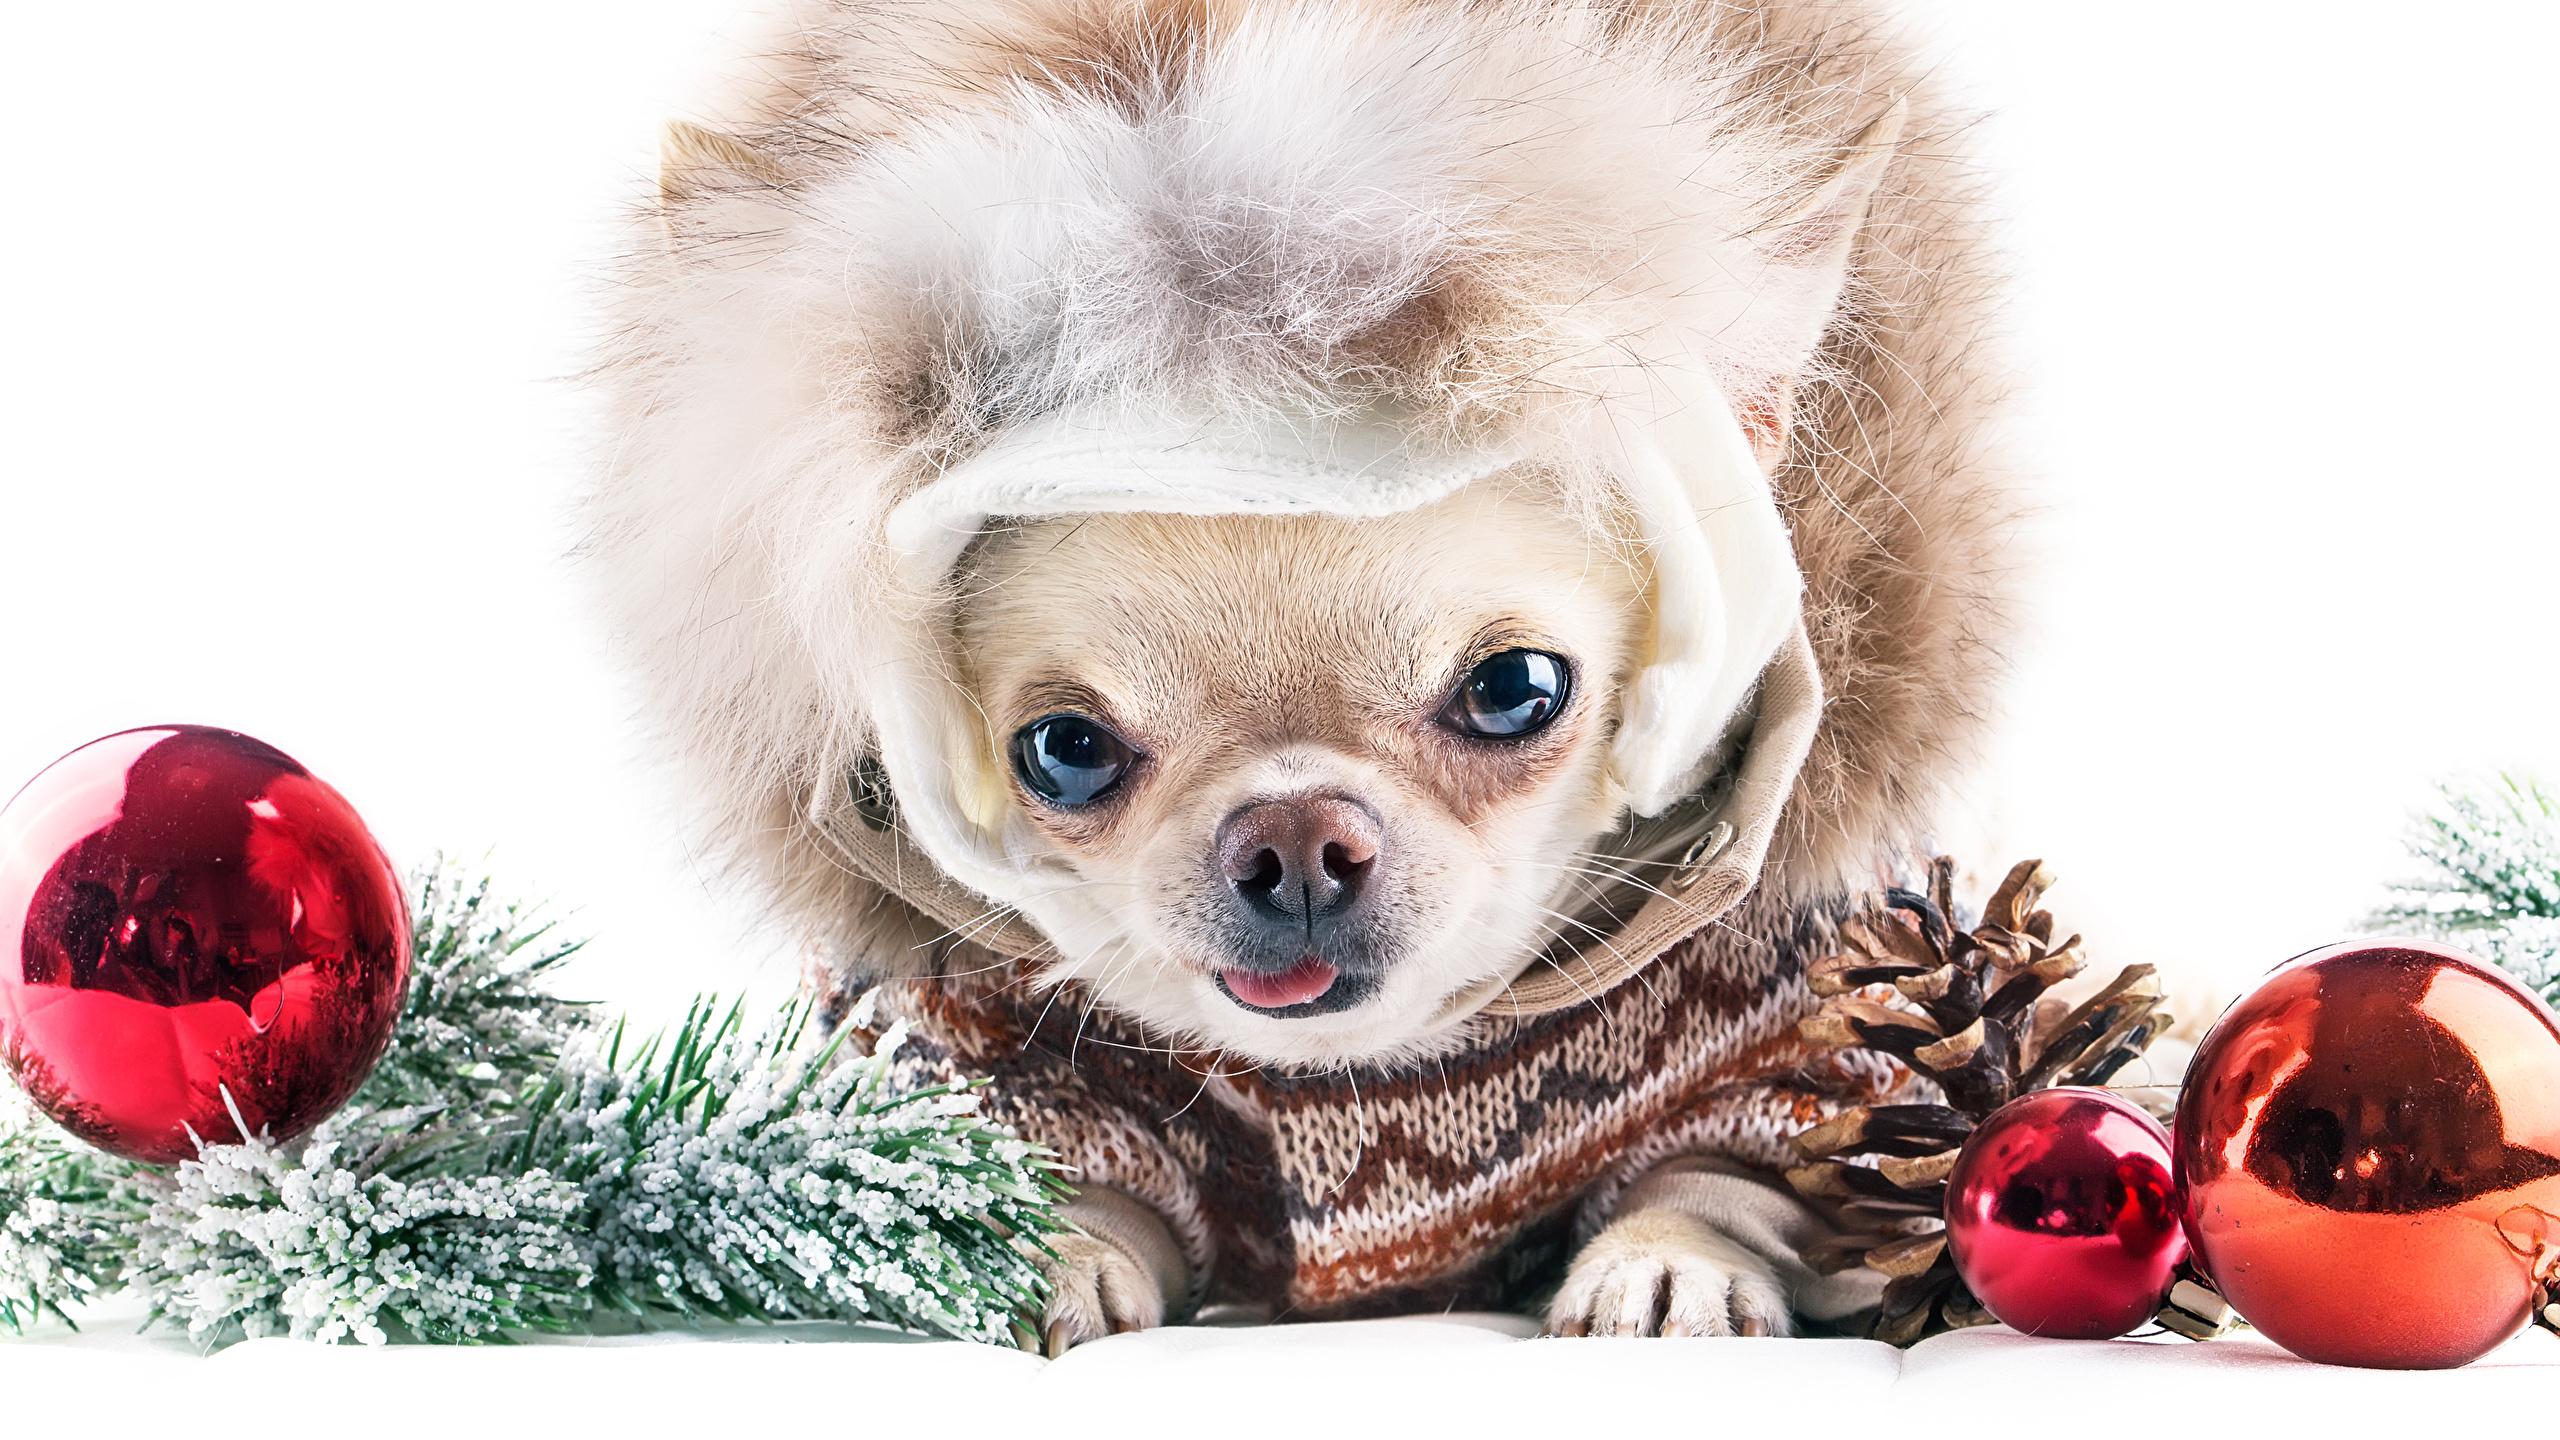 Fonds Decran 2560x1440 Nouvel An Chien Fond Blanc Chihuahua